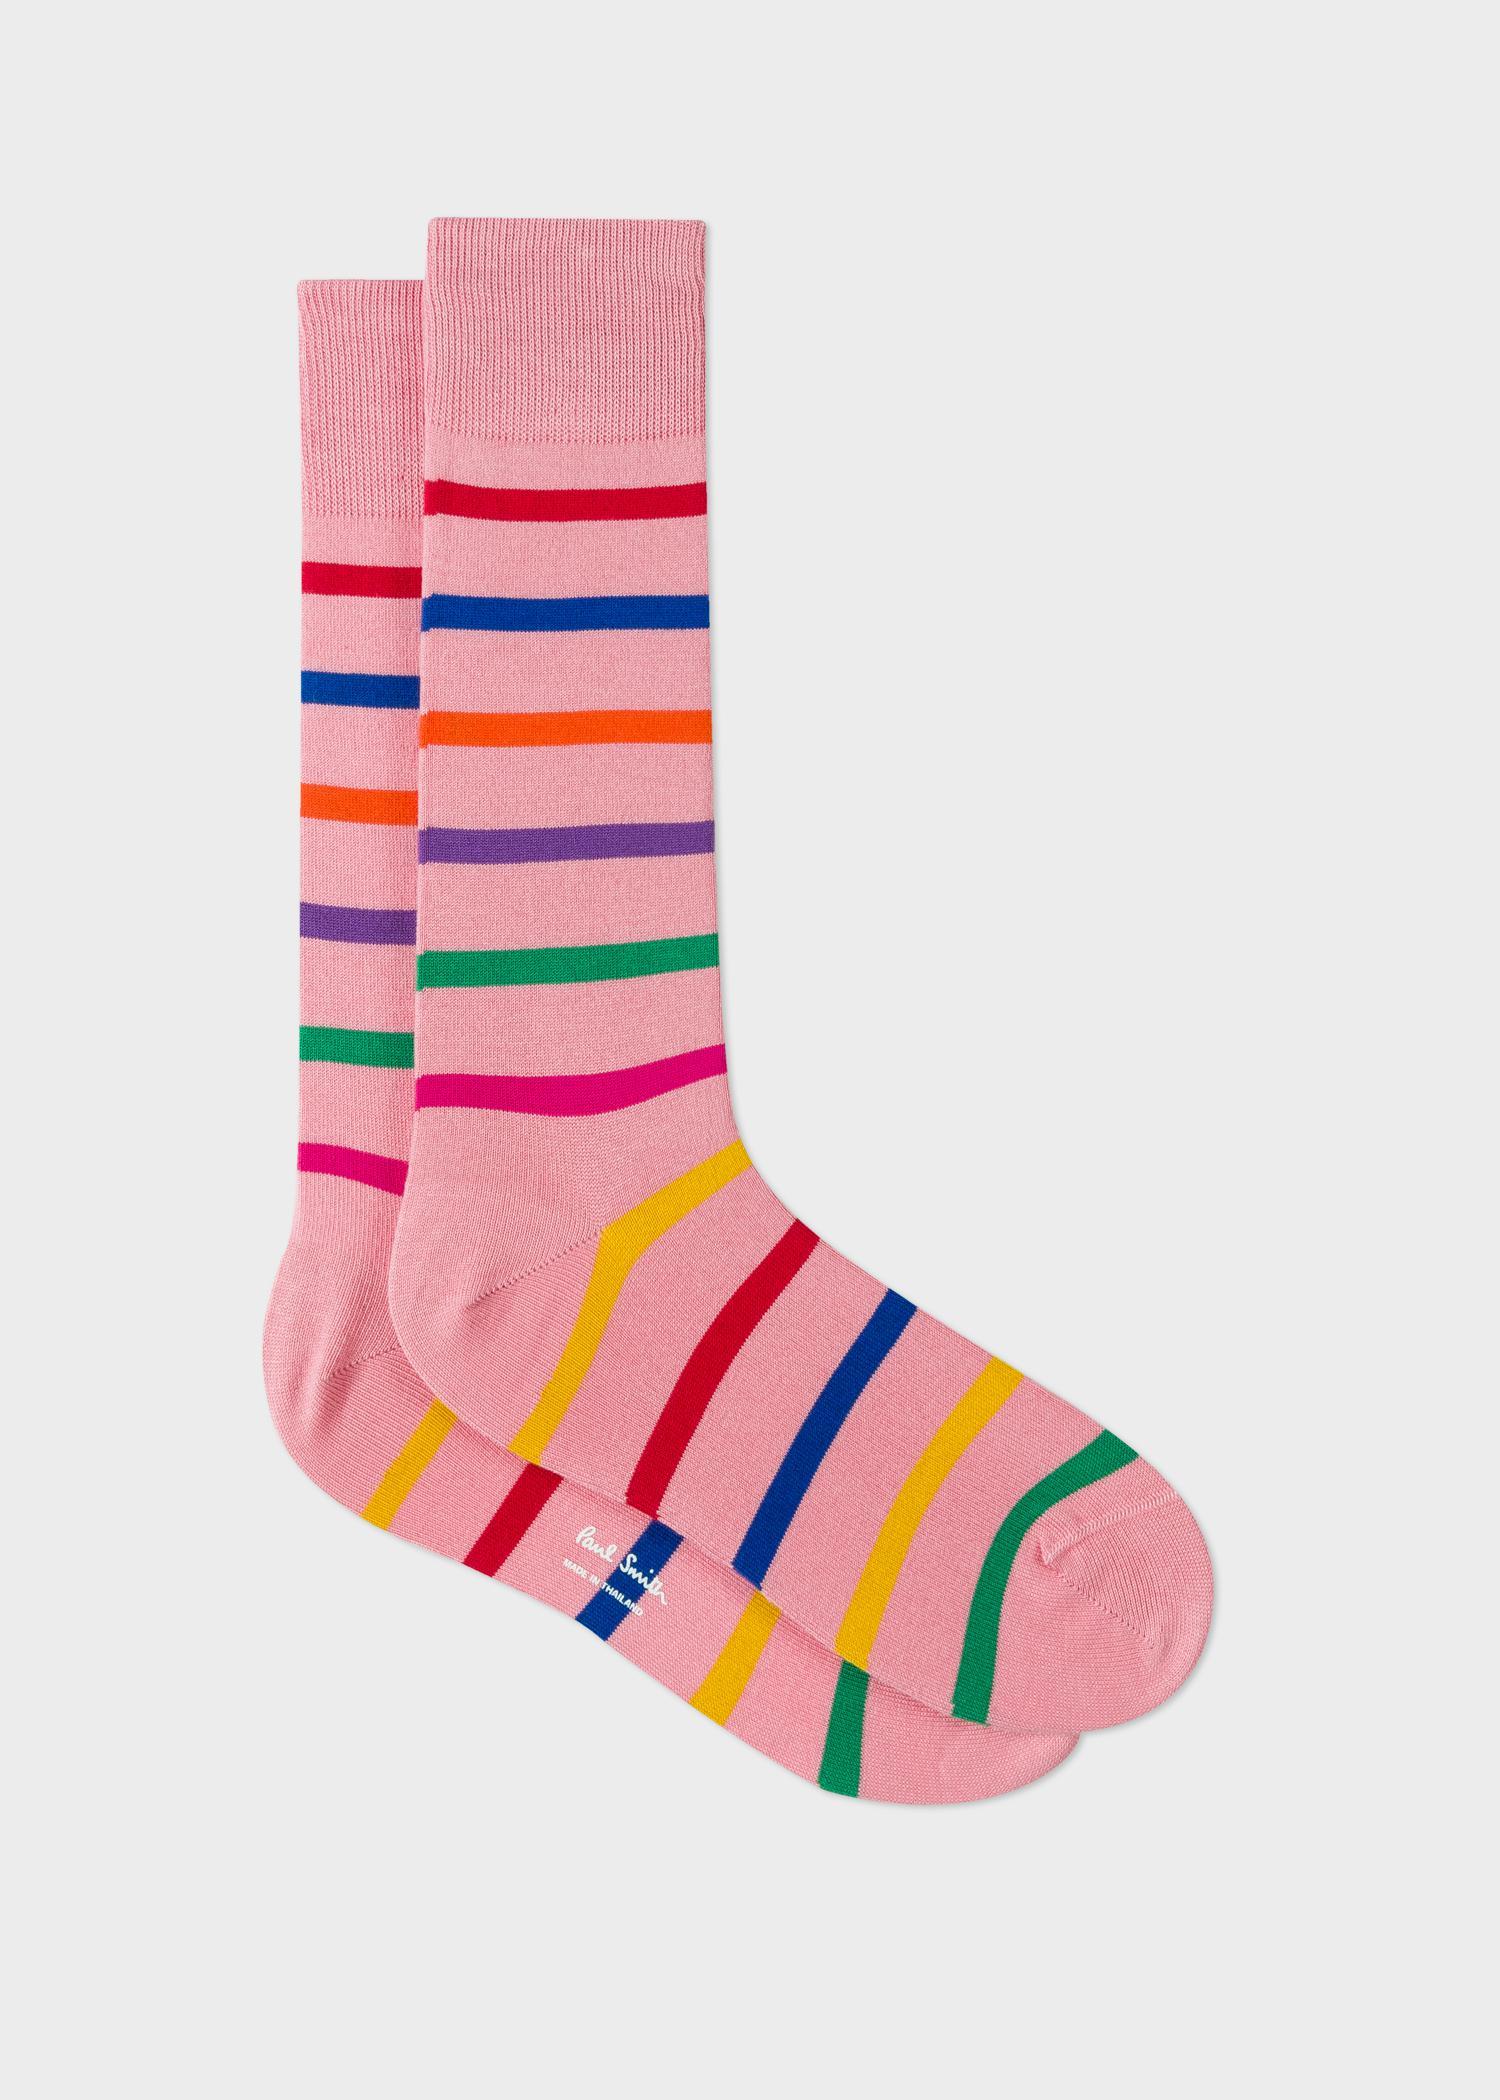 4937211aa46 Lyst - Paul Smith Pink Multi-Colour Stripe Socks in Pink for Men